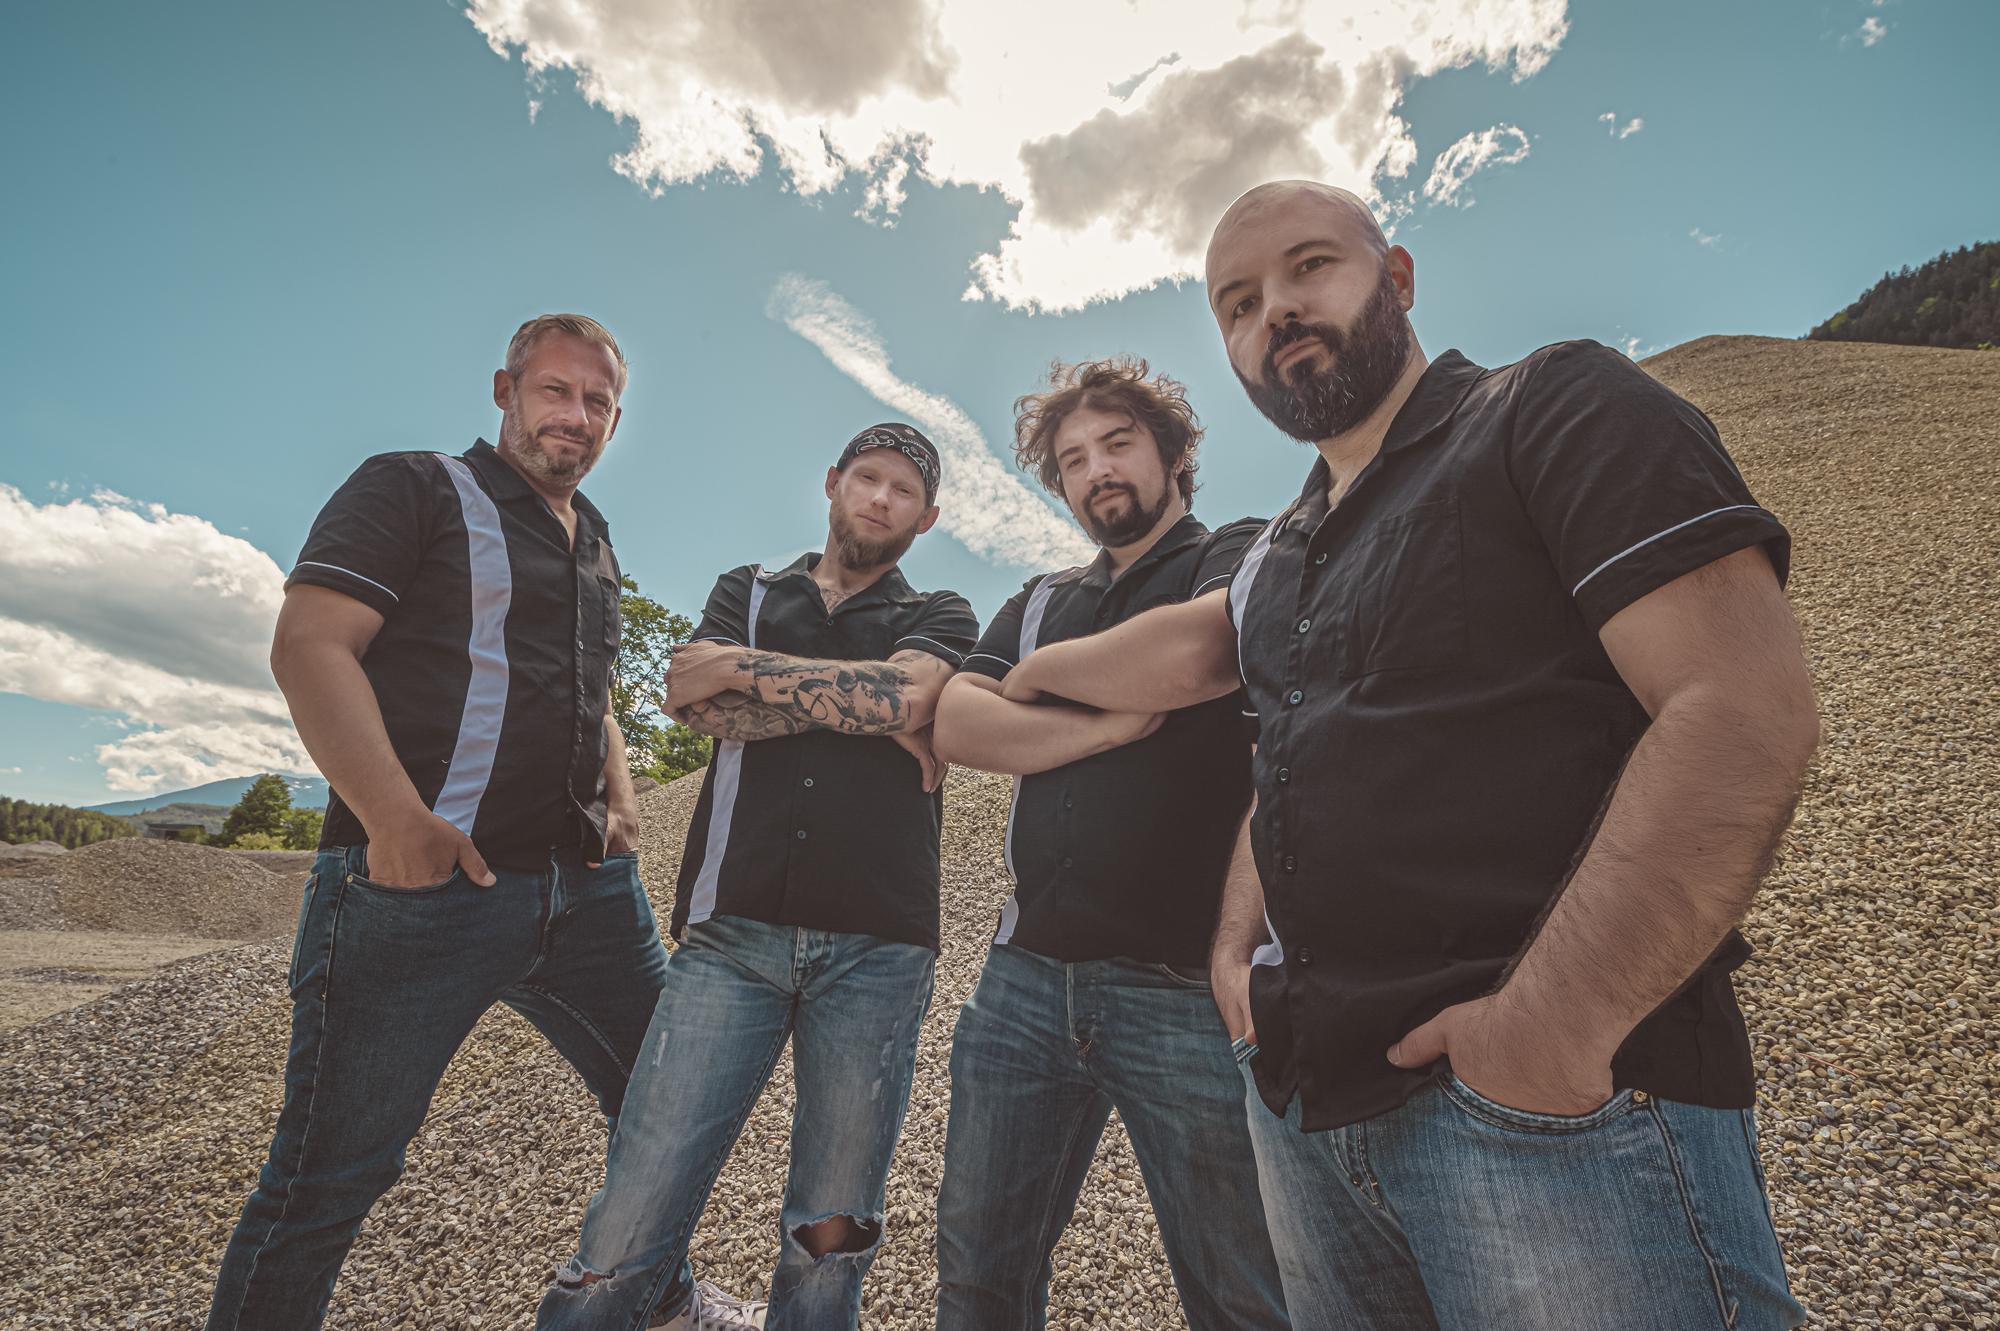 DSC5931 - Rock Band